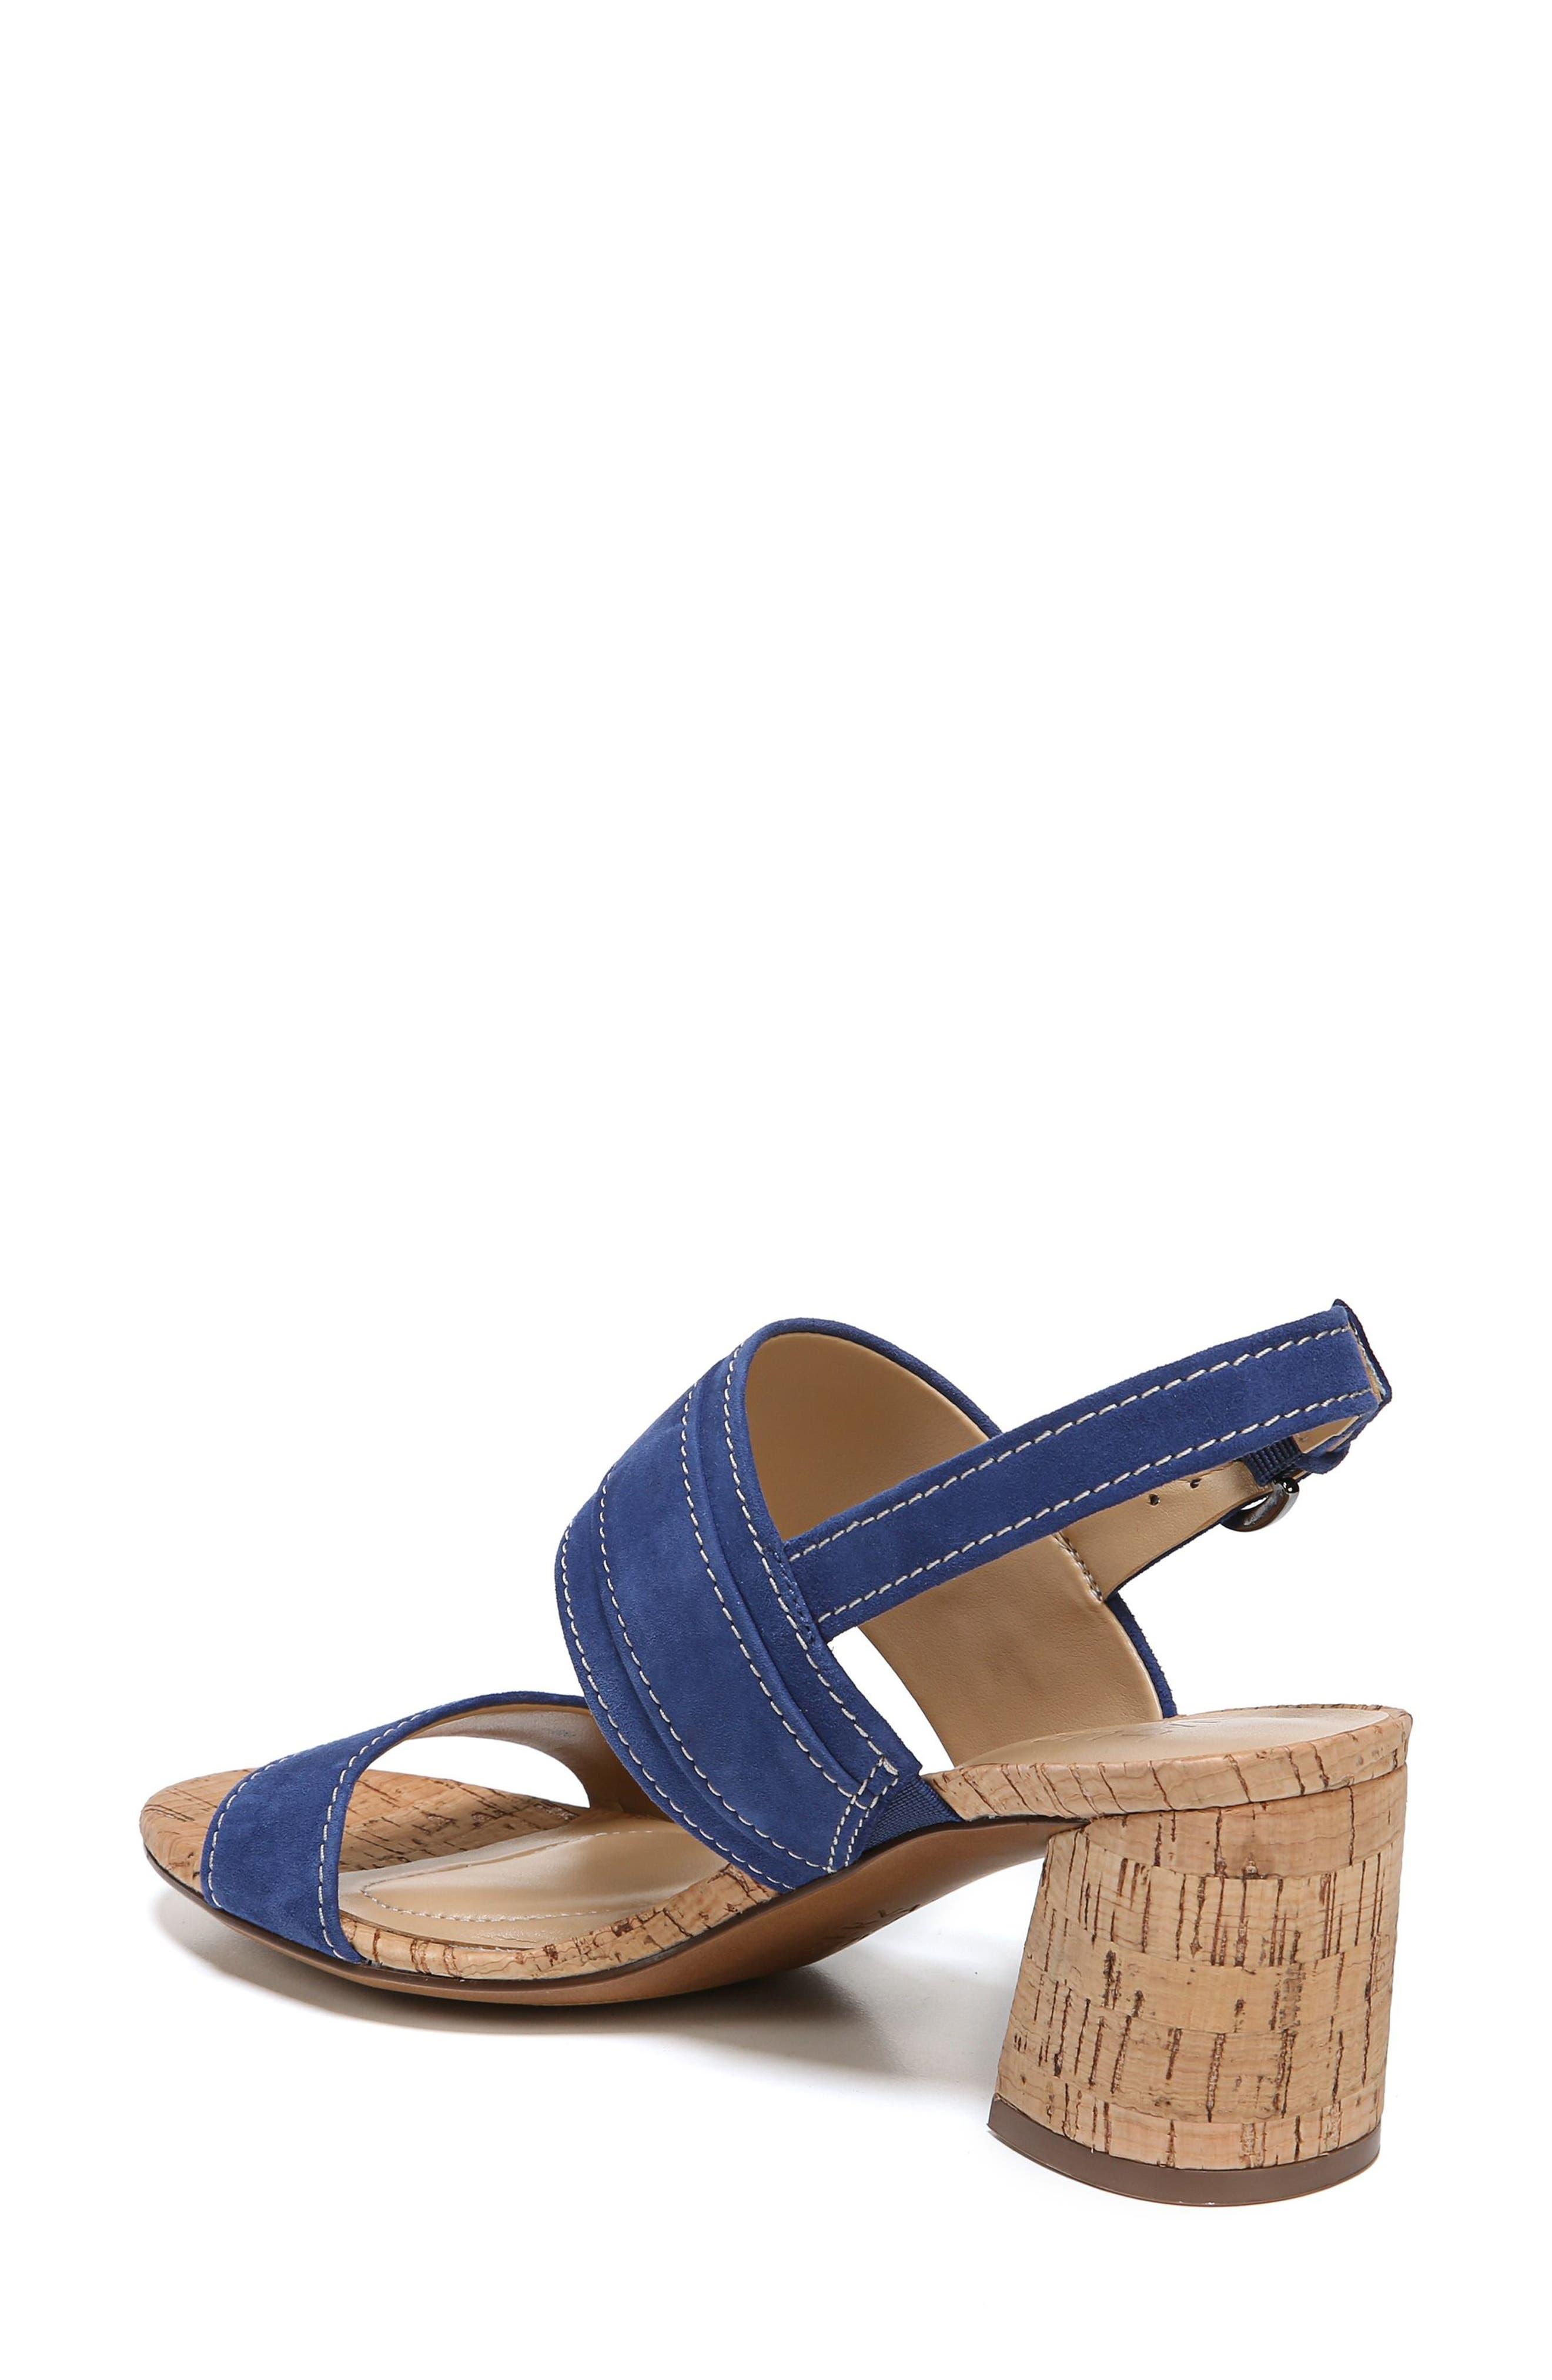 Camden Sandal,                             Alternate thumbnail 2, color,                             Blue Suede